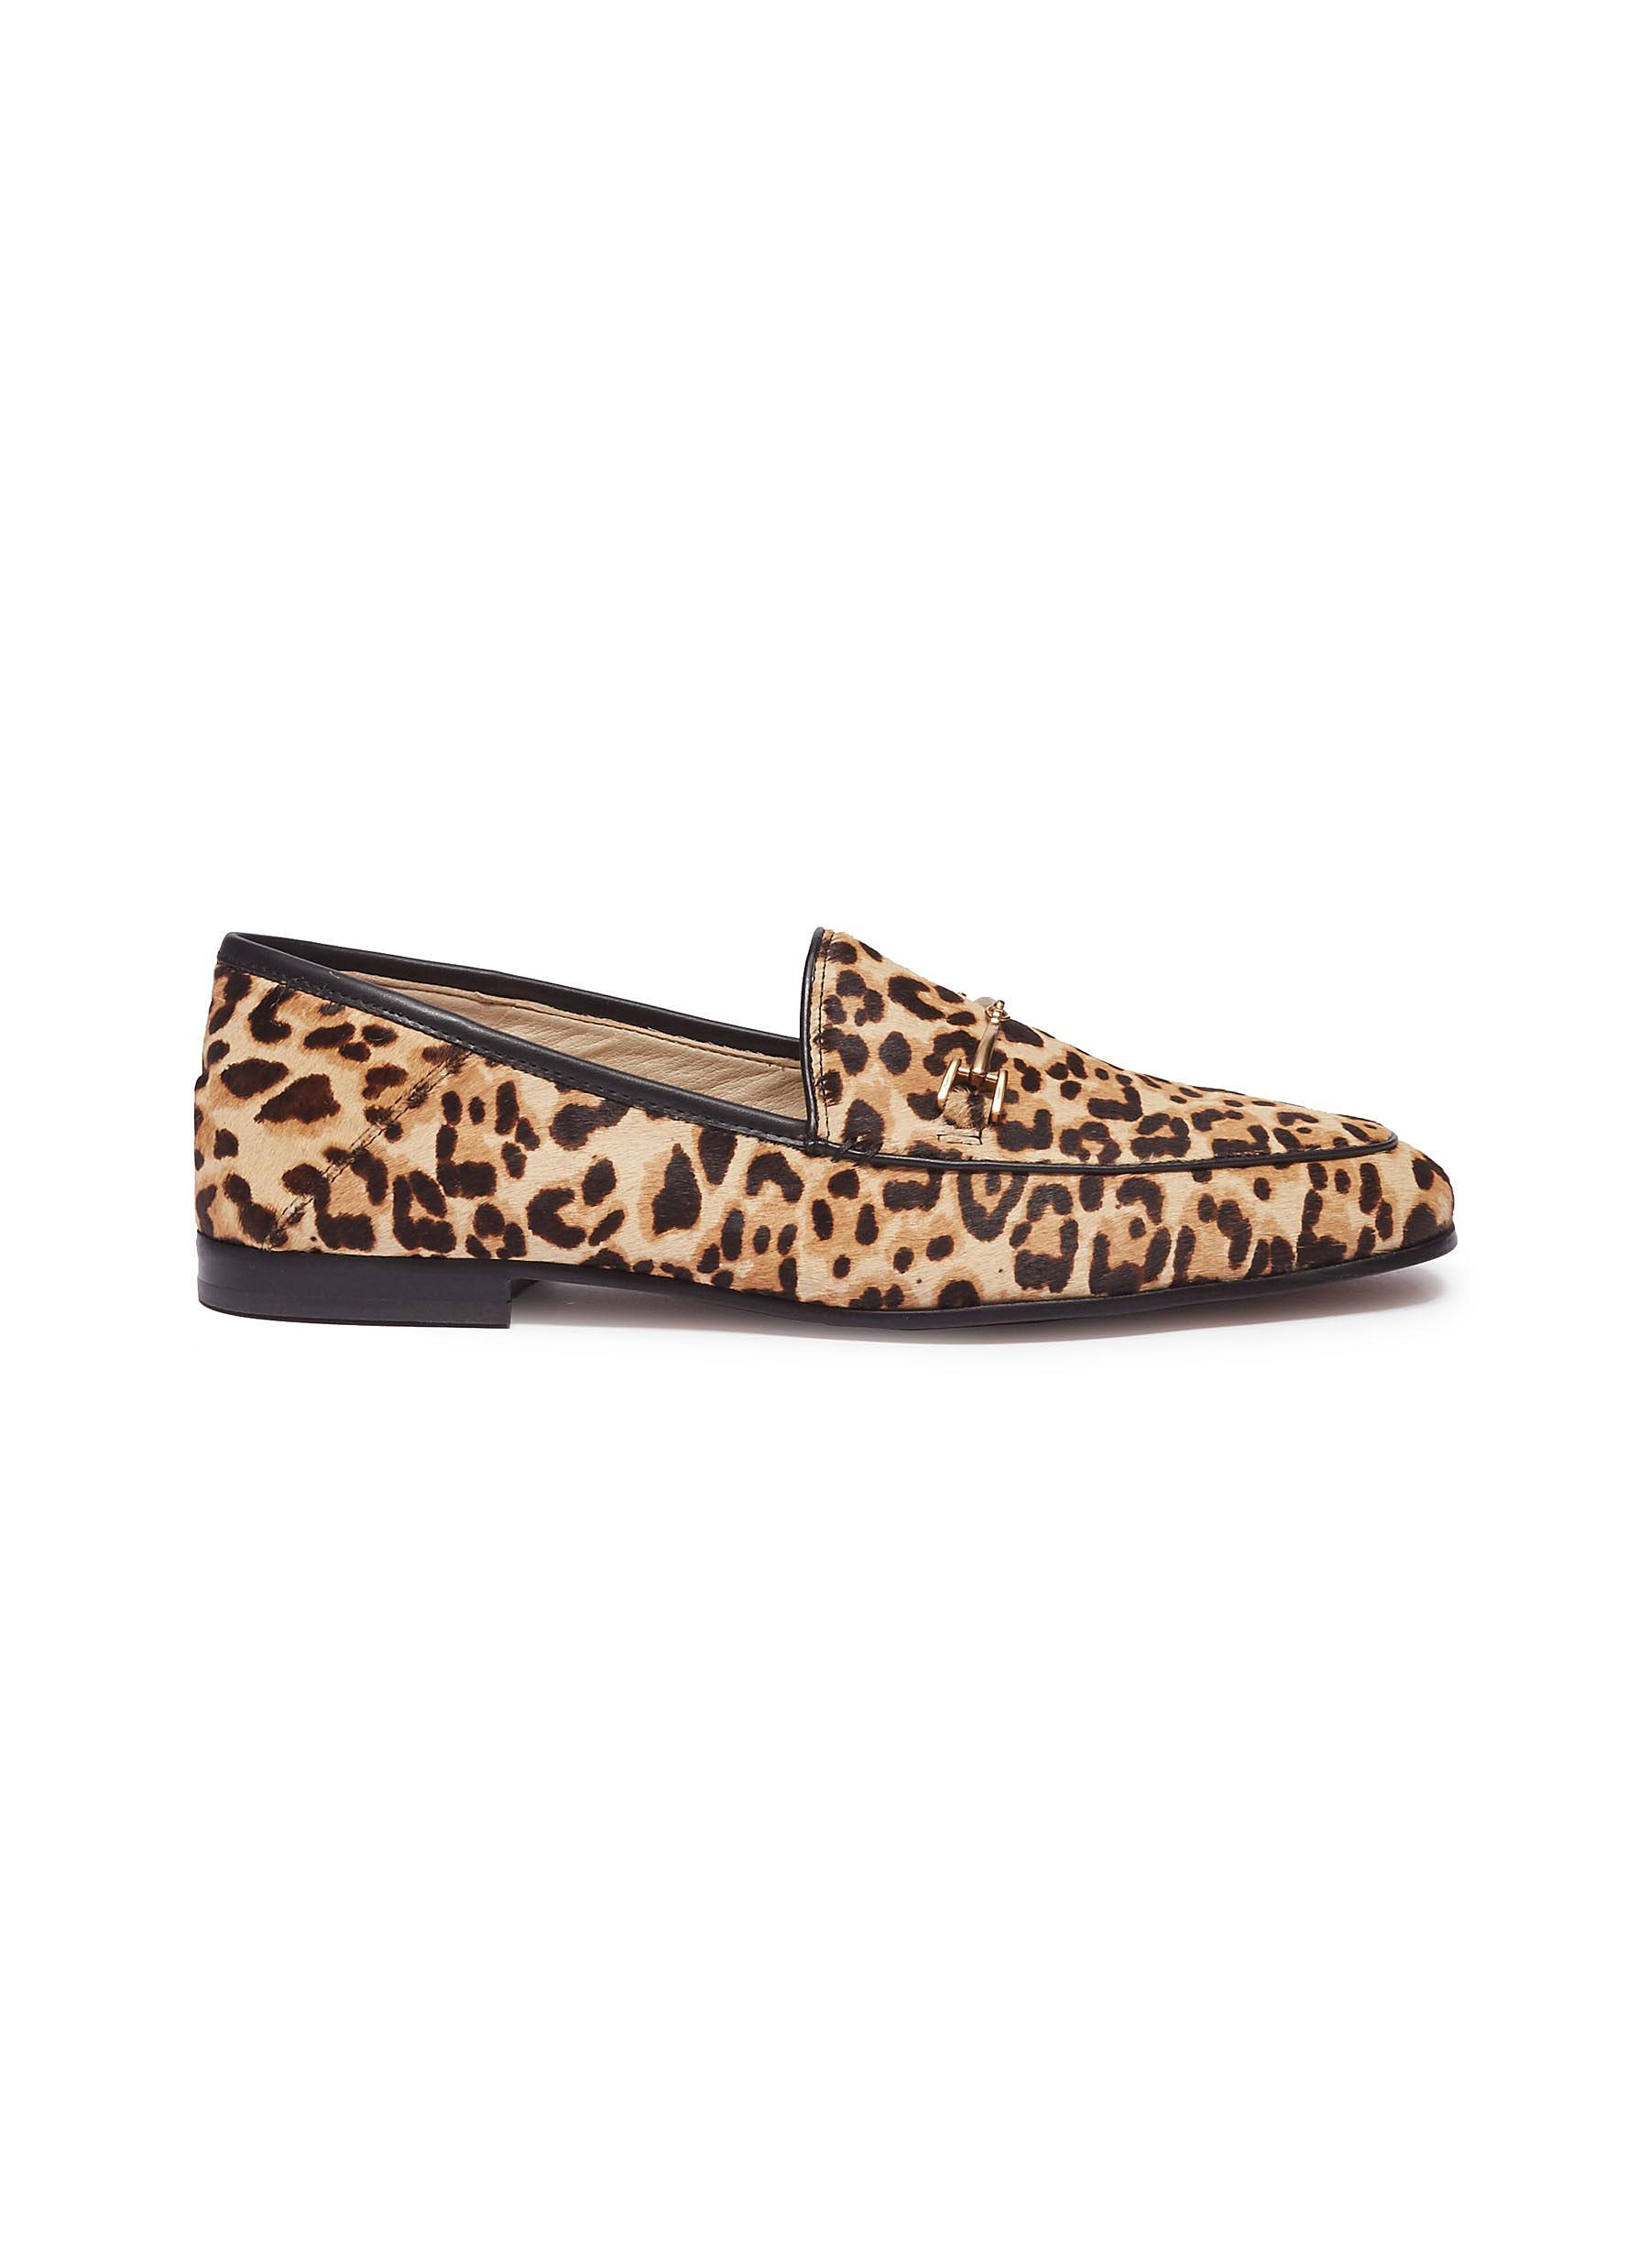 05a168d01f8 Sam Edelman. Women s Brown  lorraine  Horsebit Leopard Print Cow Hair  Step-in Loafers